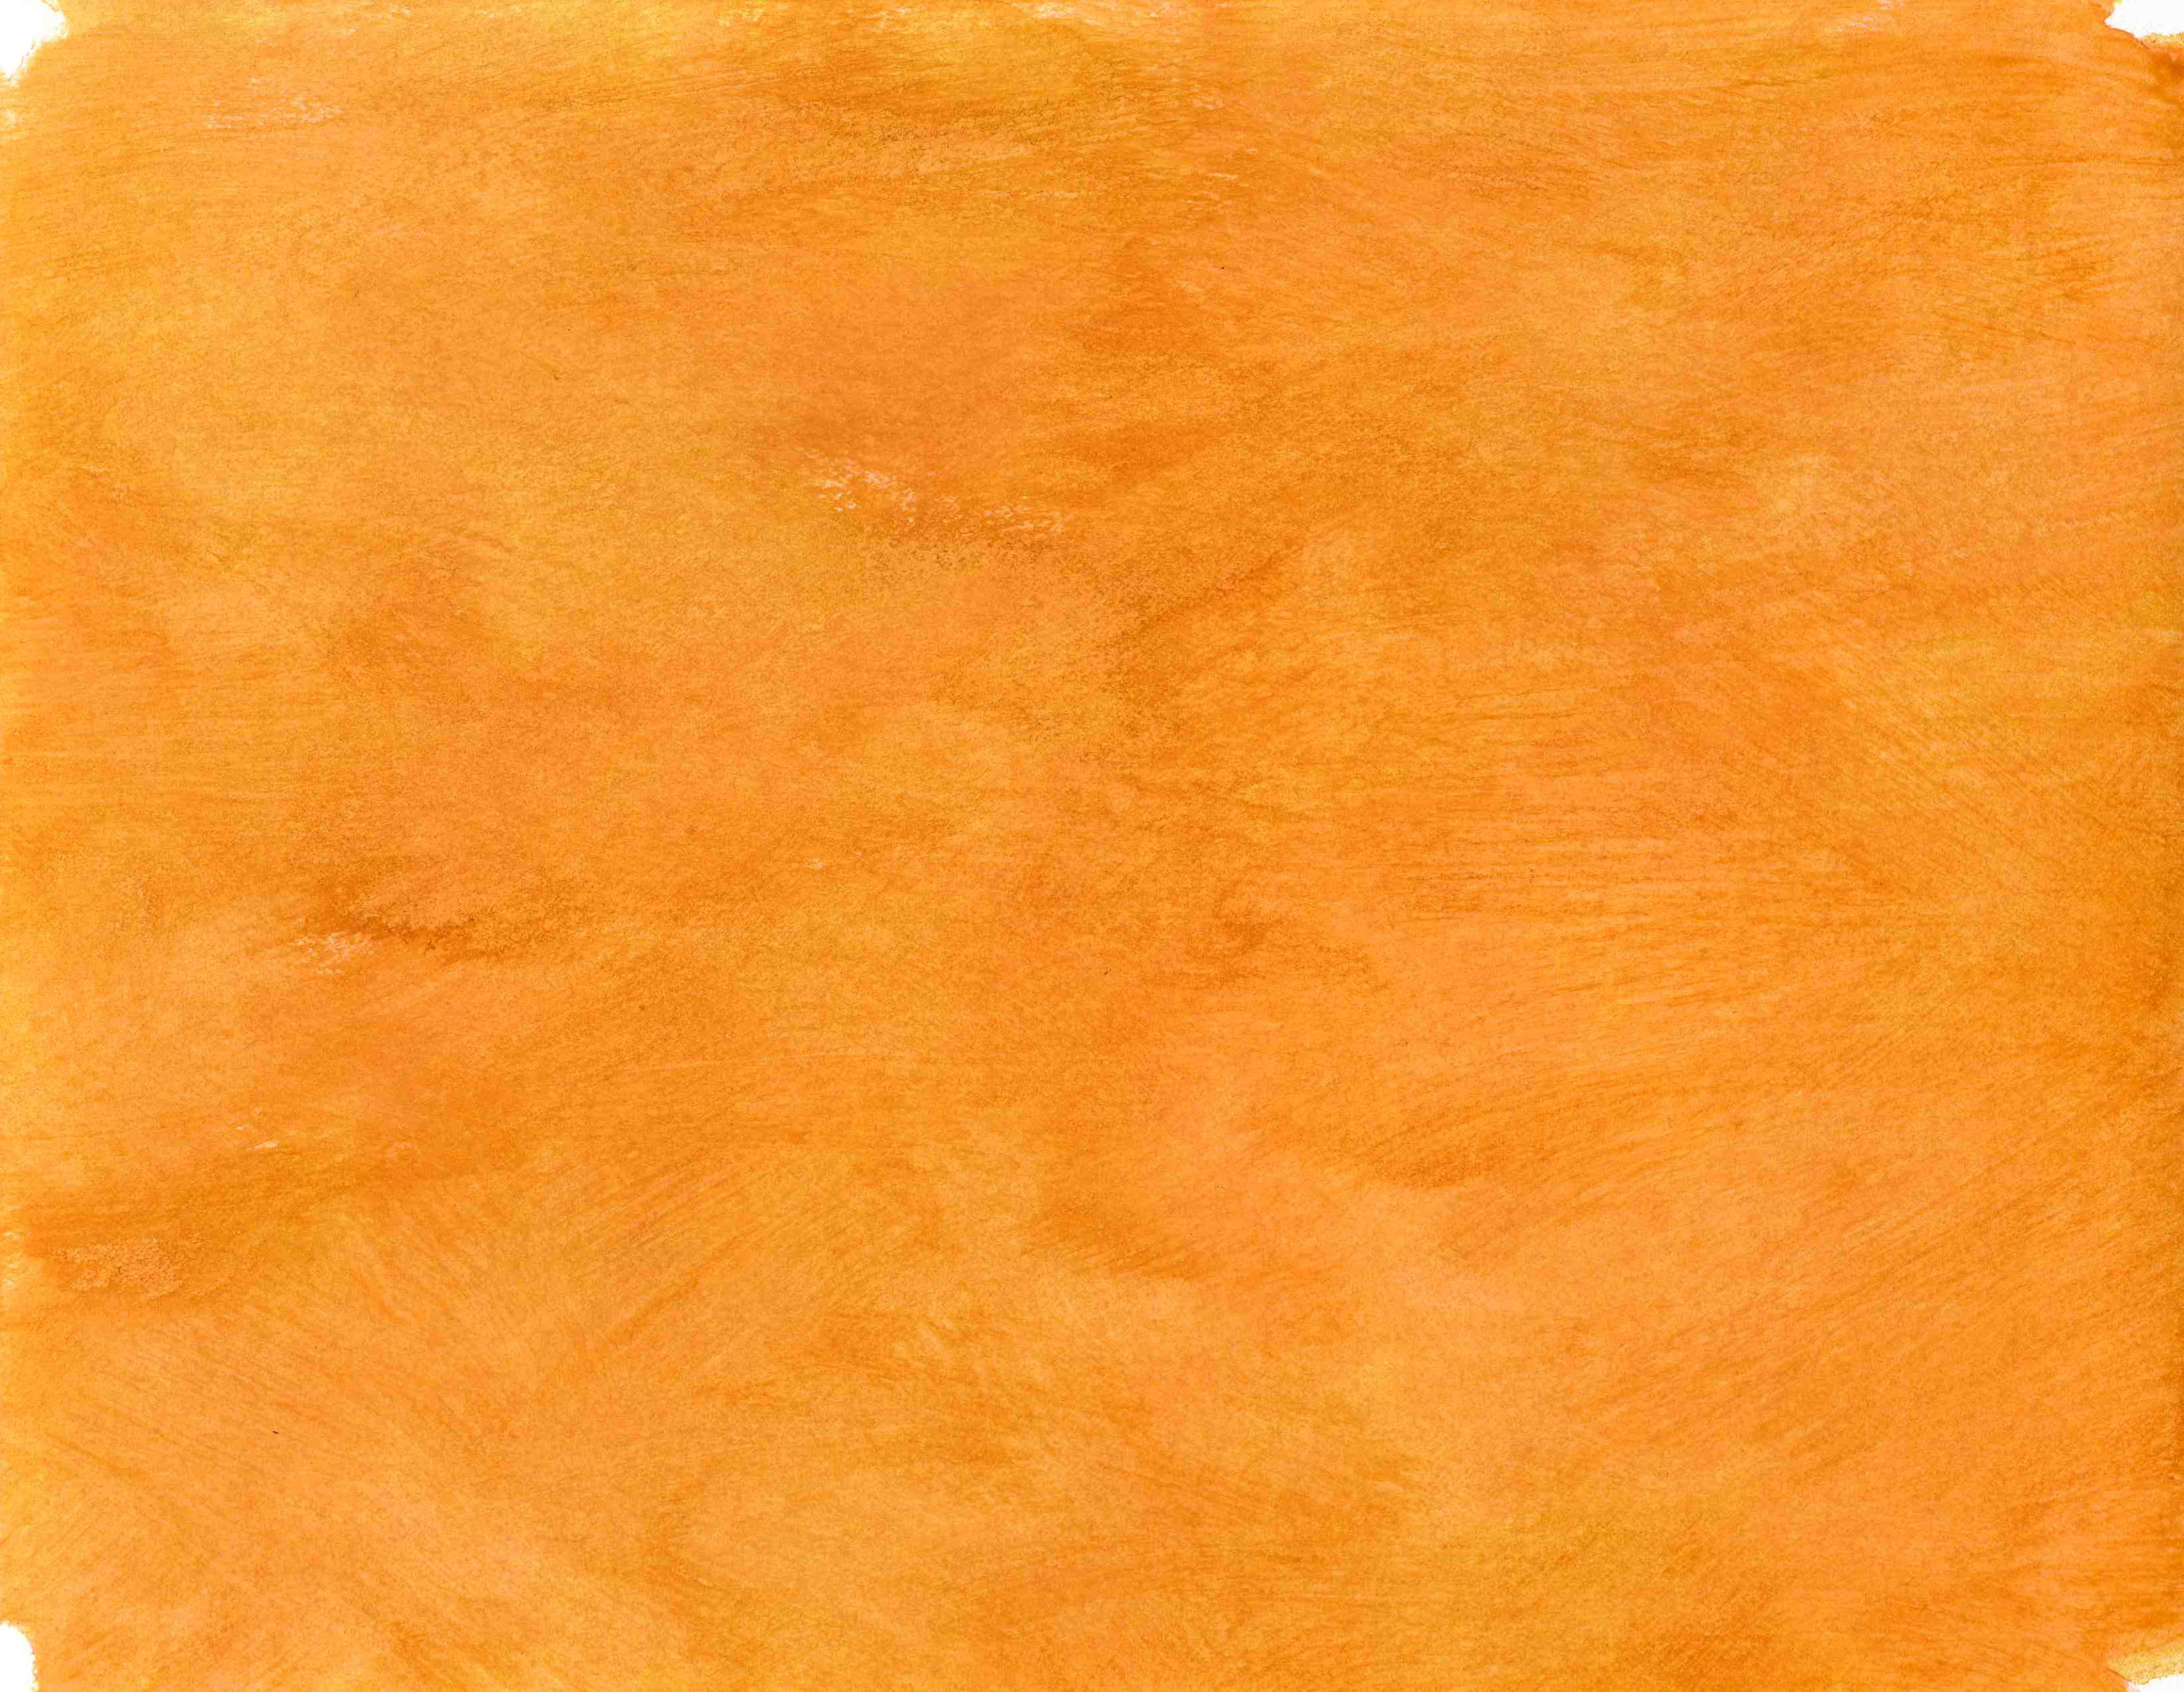 Neon Orange Background - WallpaperSafari